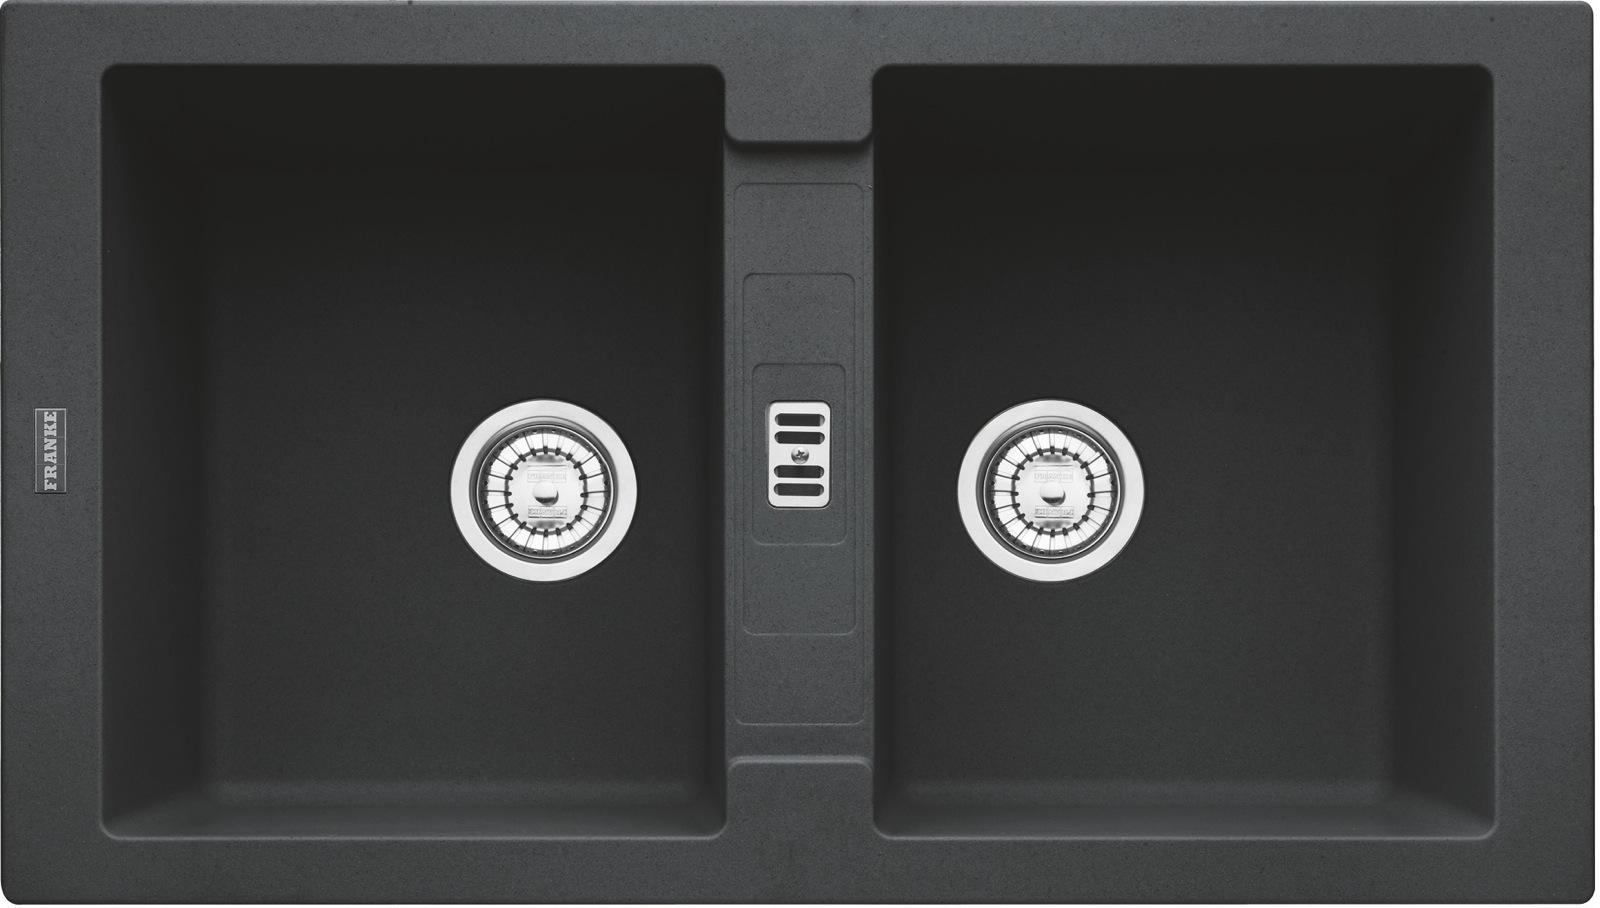 Chiuveta bucatarie fragranite Franke Maris MRG 620 cu doua cuve 860x500mm tehnologie Sanitized Nero imagine sensodays.ro